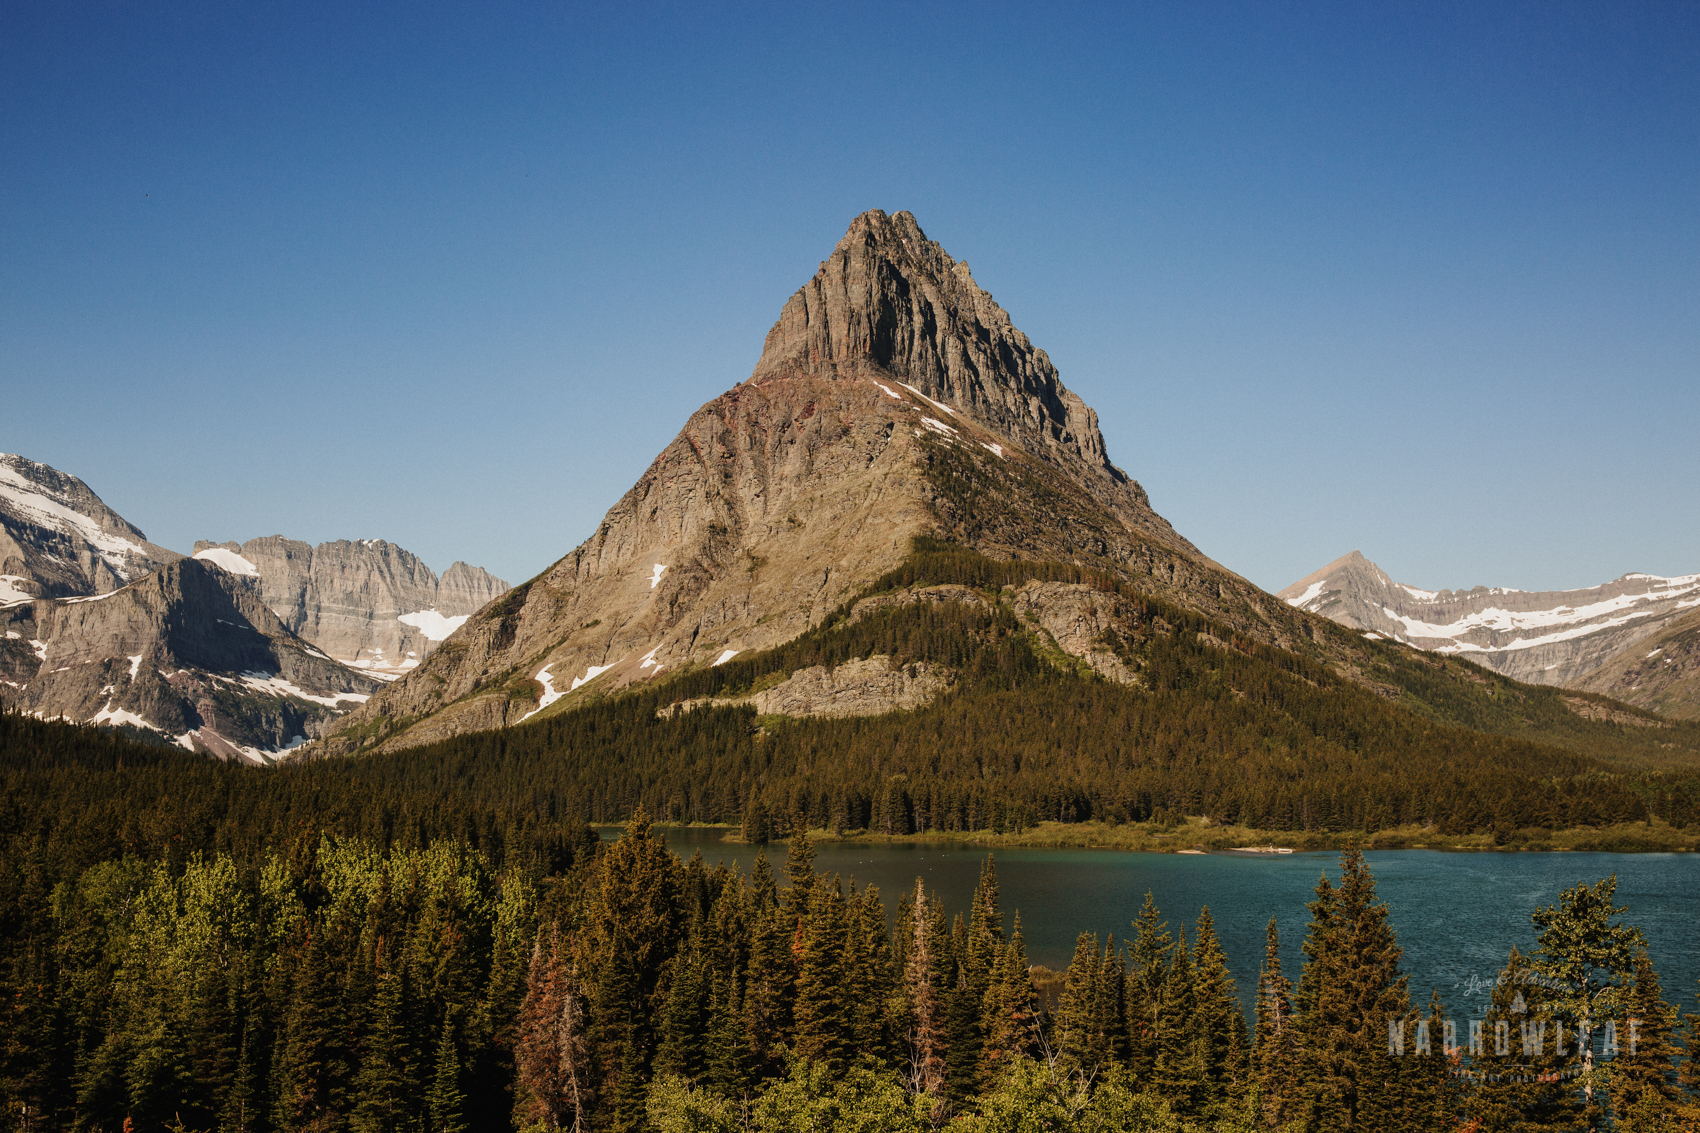 Montana-Glacier-National-Park-Many-Glacier-Narrowleaf-Love-and-Adventure-elopement-Photography-9324.jpg